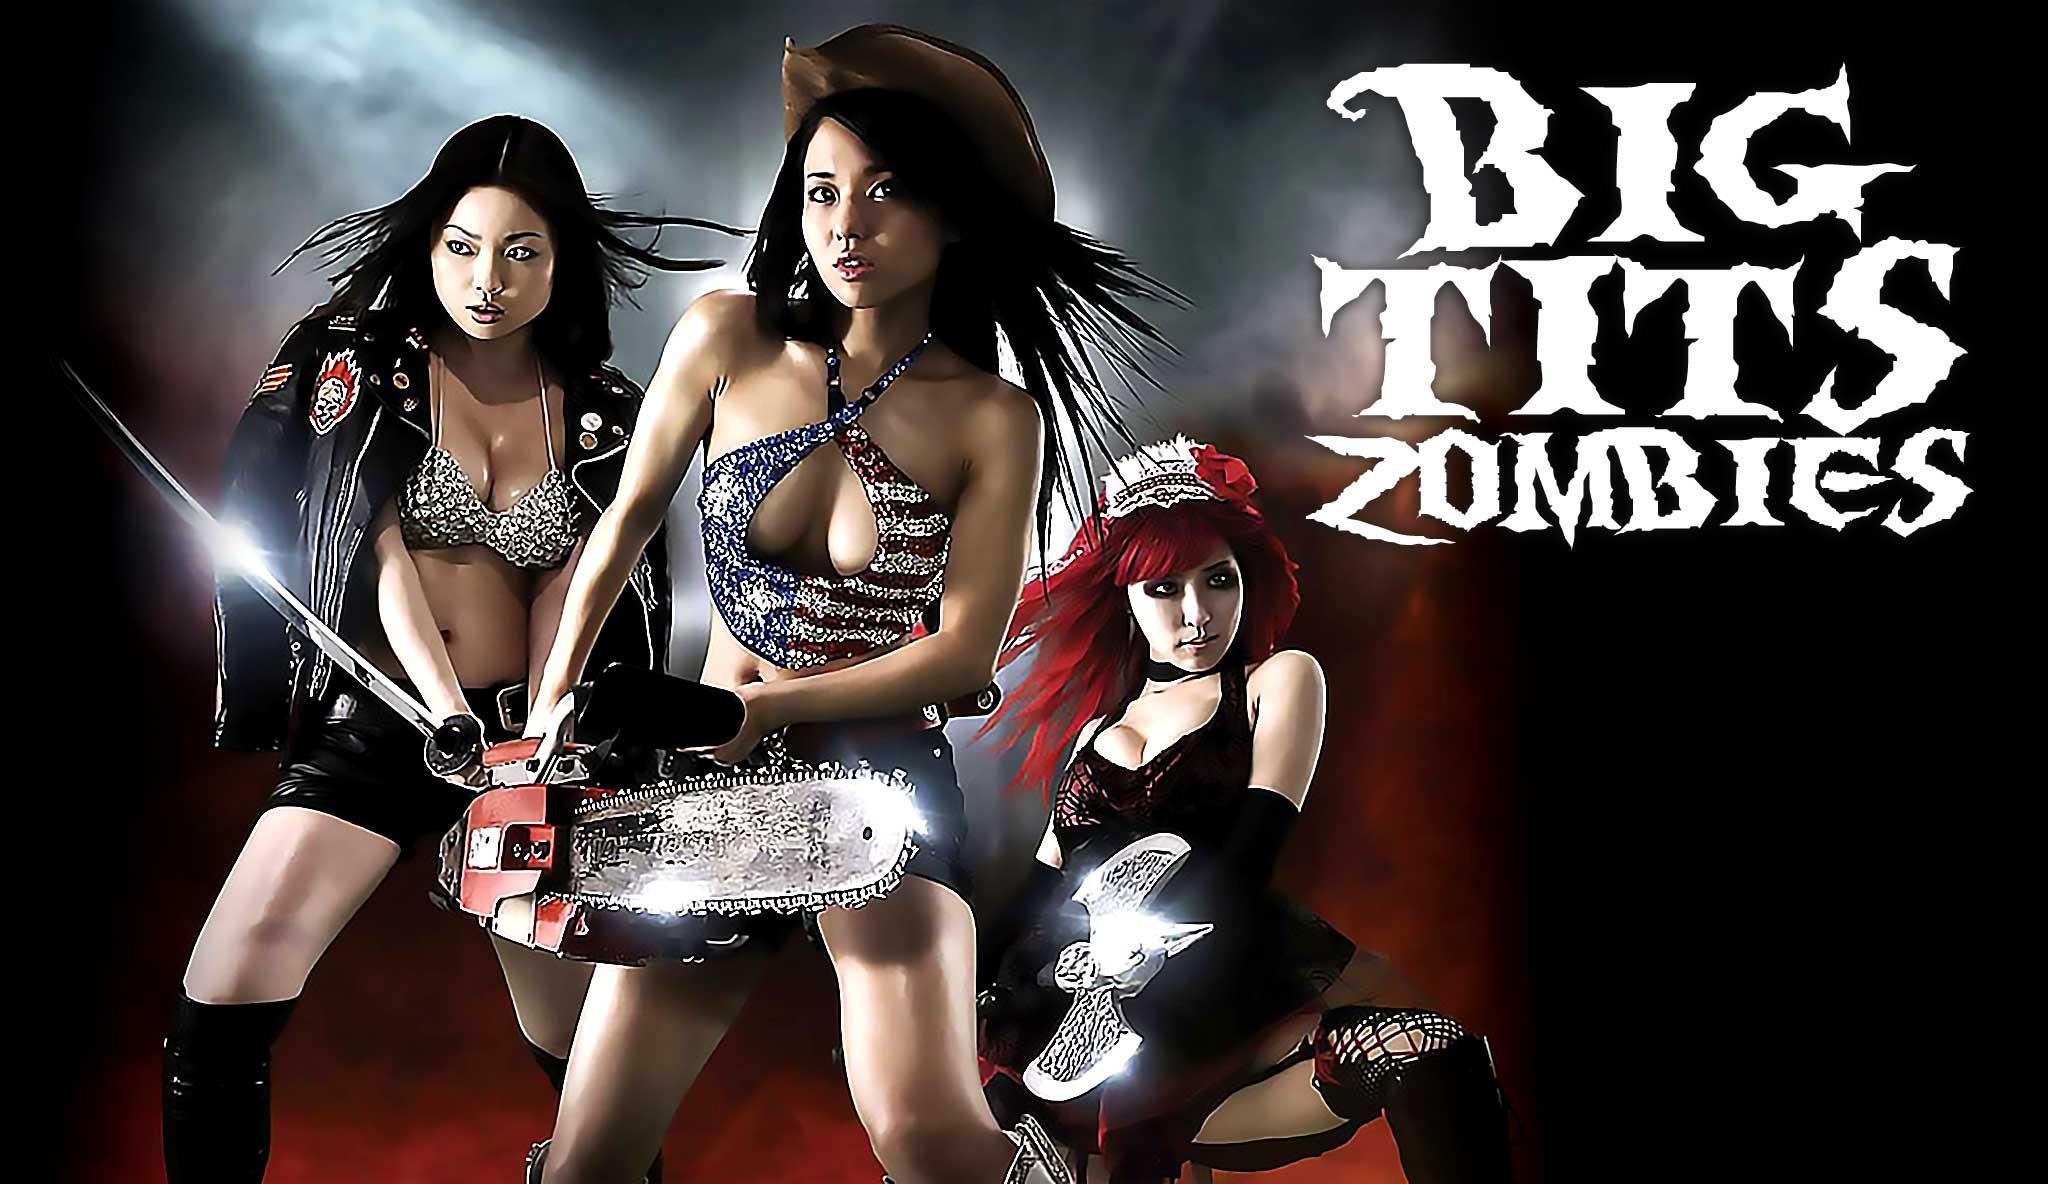 big-tits-zombies\header.jpg